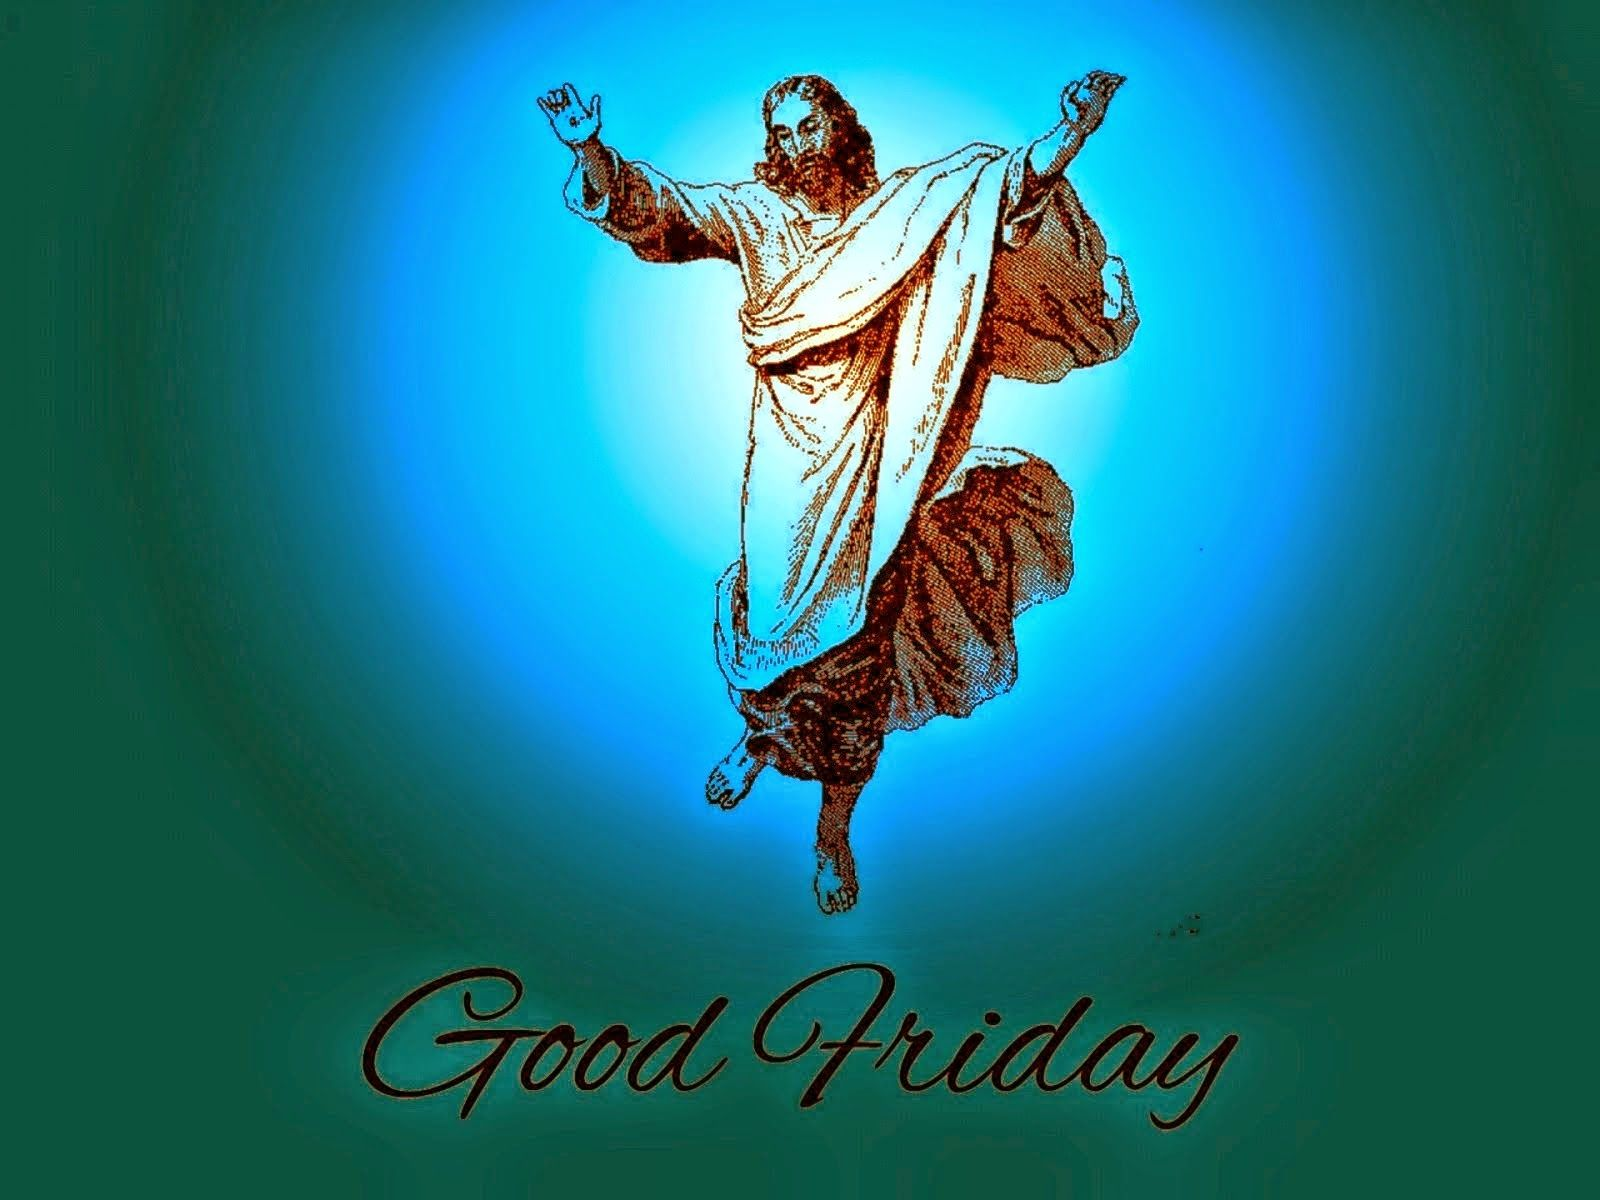 Hd wallpaper yeshu - Good Friday Jesus Christ Hd Wallpapers